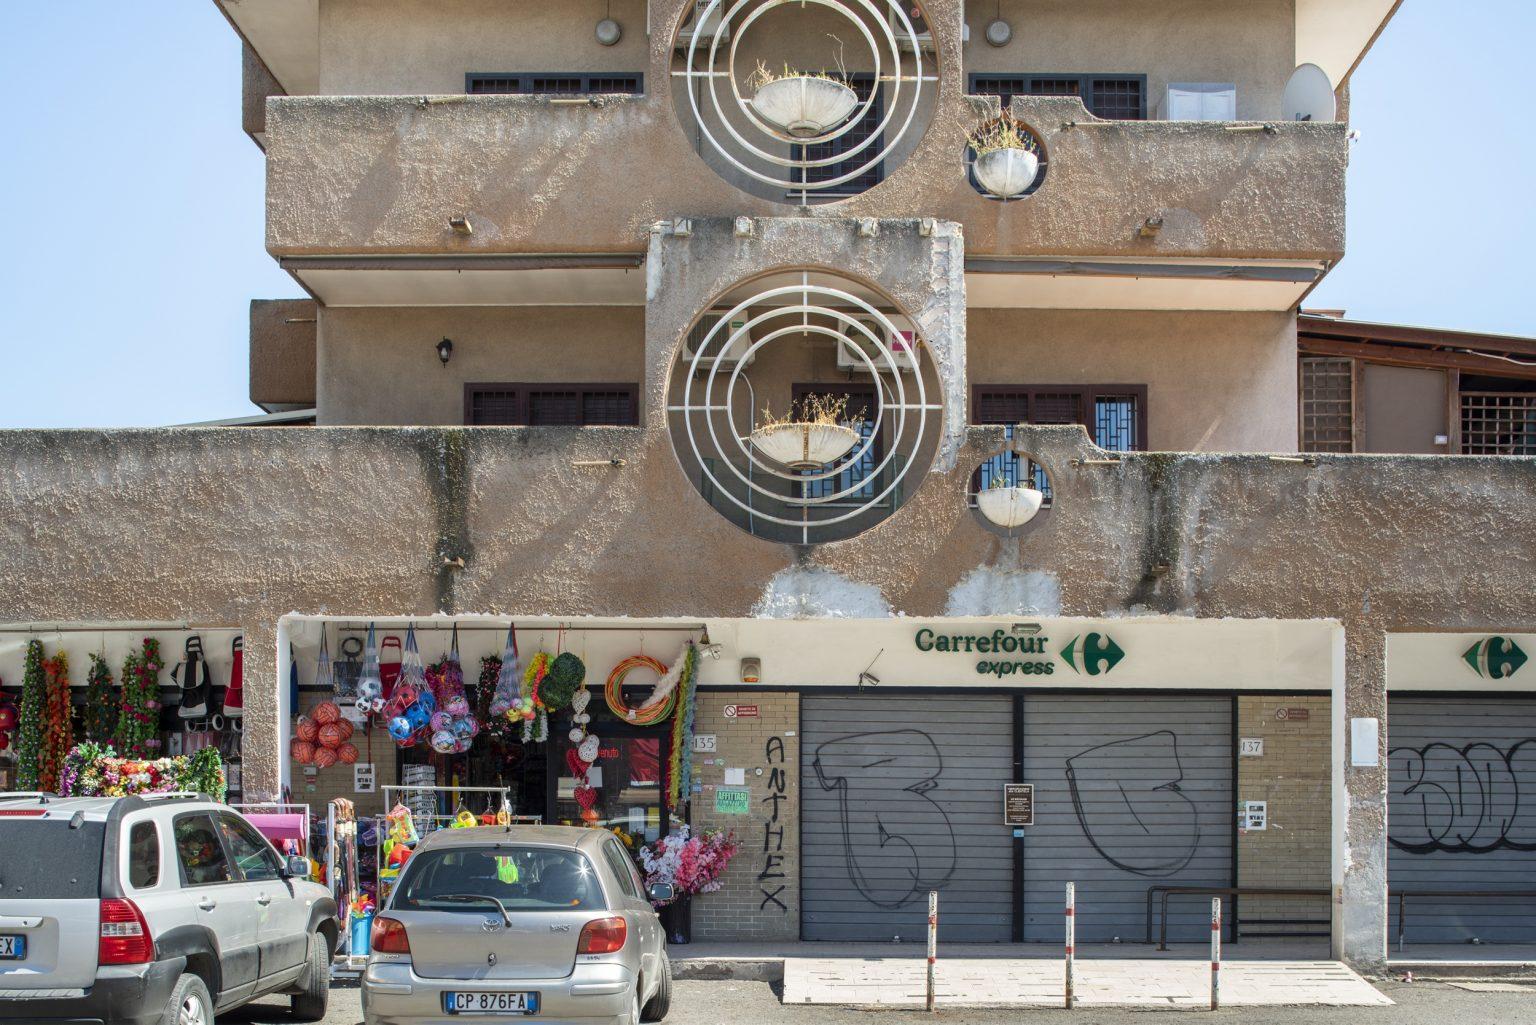 Rome, April 2017 - Via dei Giardinetti. Torre Maura district. >< Roma, aprile 2017 - Via dei Giardinetti. Quartiere Torre Maura.